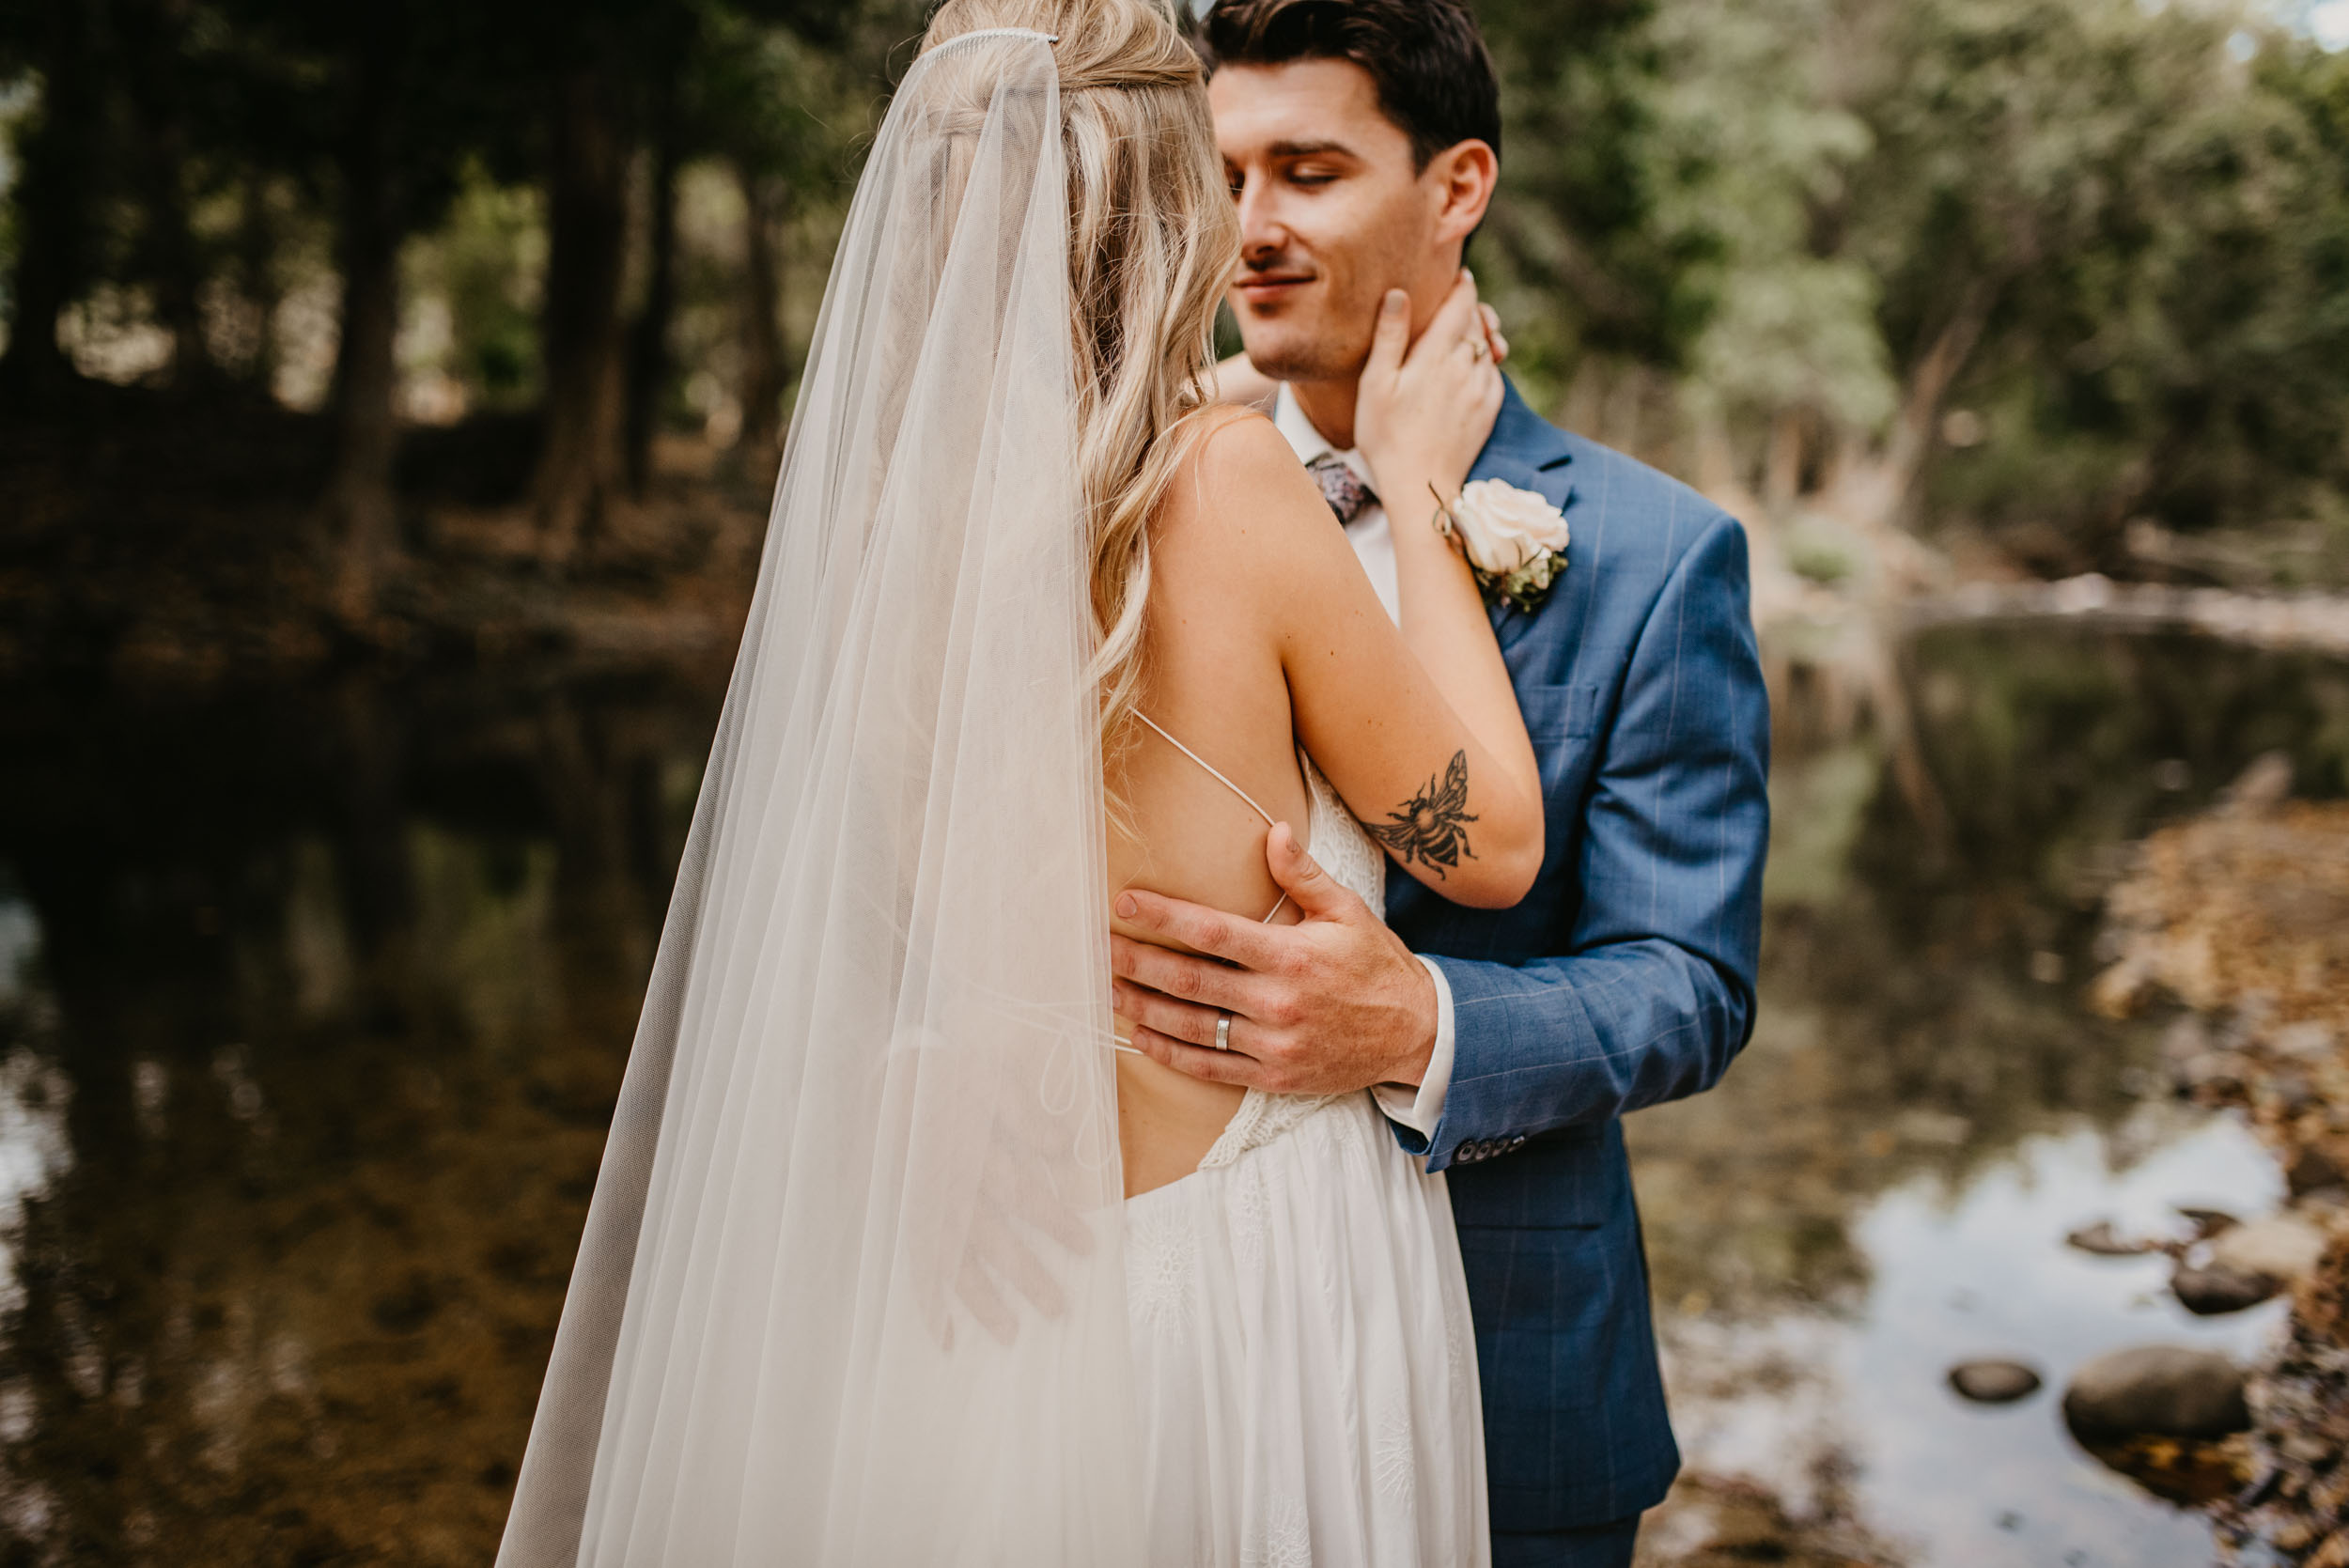 The Raw Photographer - Cairns Wedding Photographer - Laloli - Cairns Garden Wedding - Wedding Dress-51.jpg